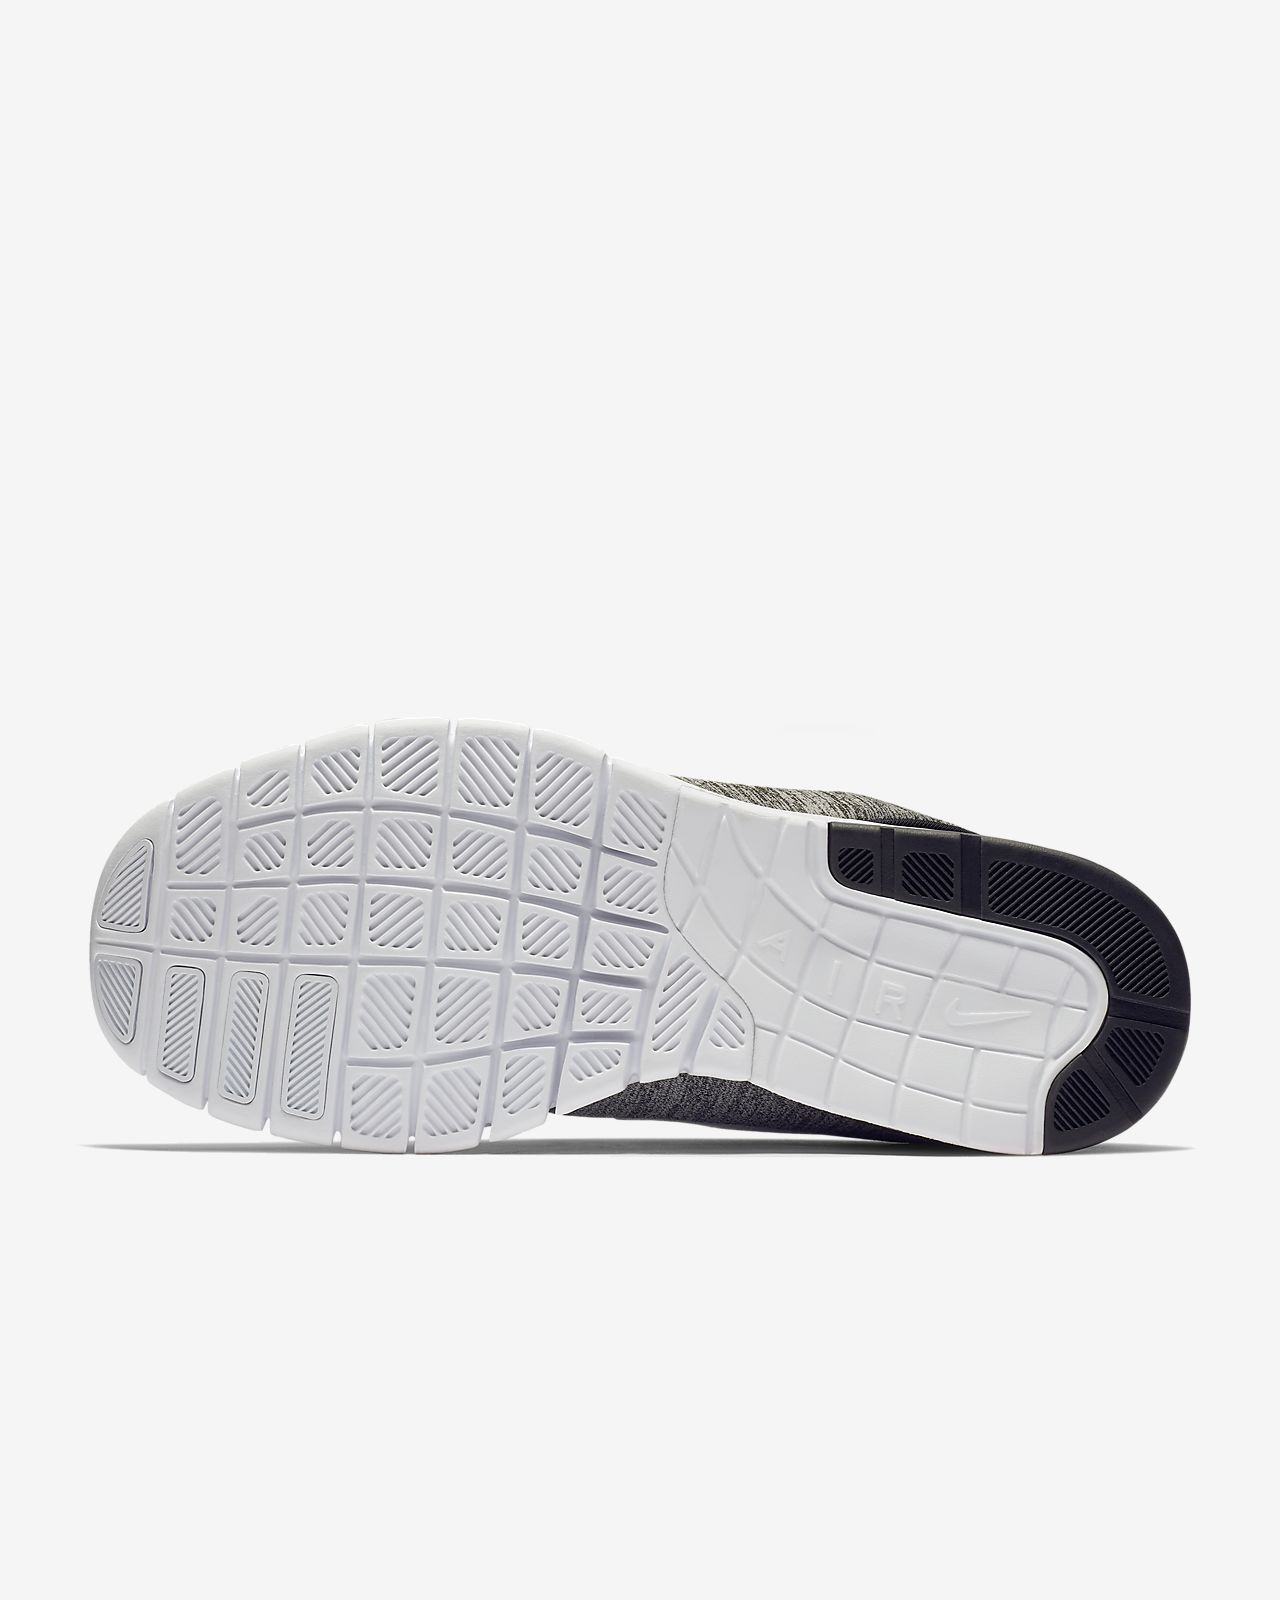 info for dcd6d 61568 ... Nike SB Stefan Janoski Max Skate Shoe